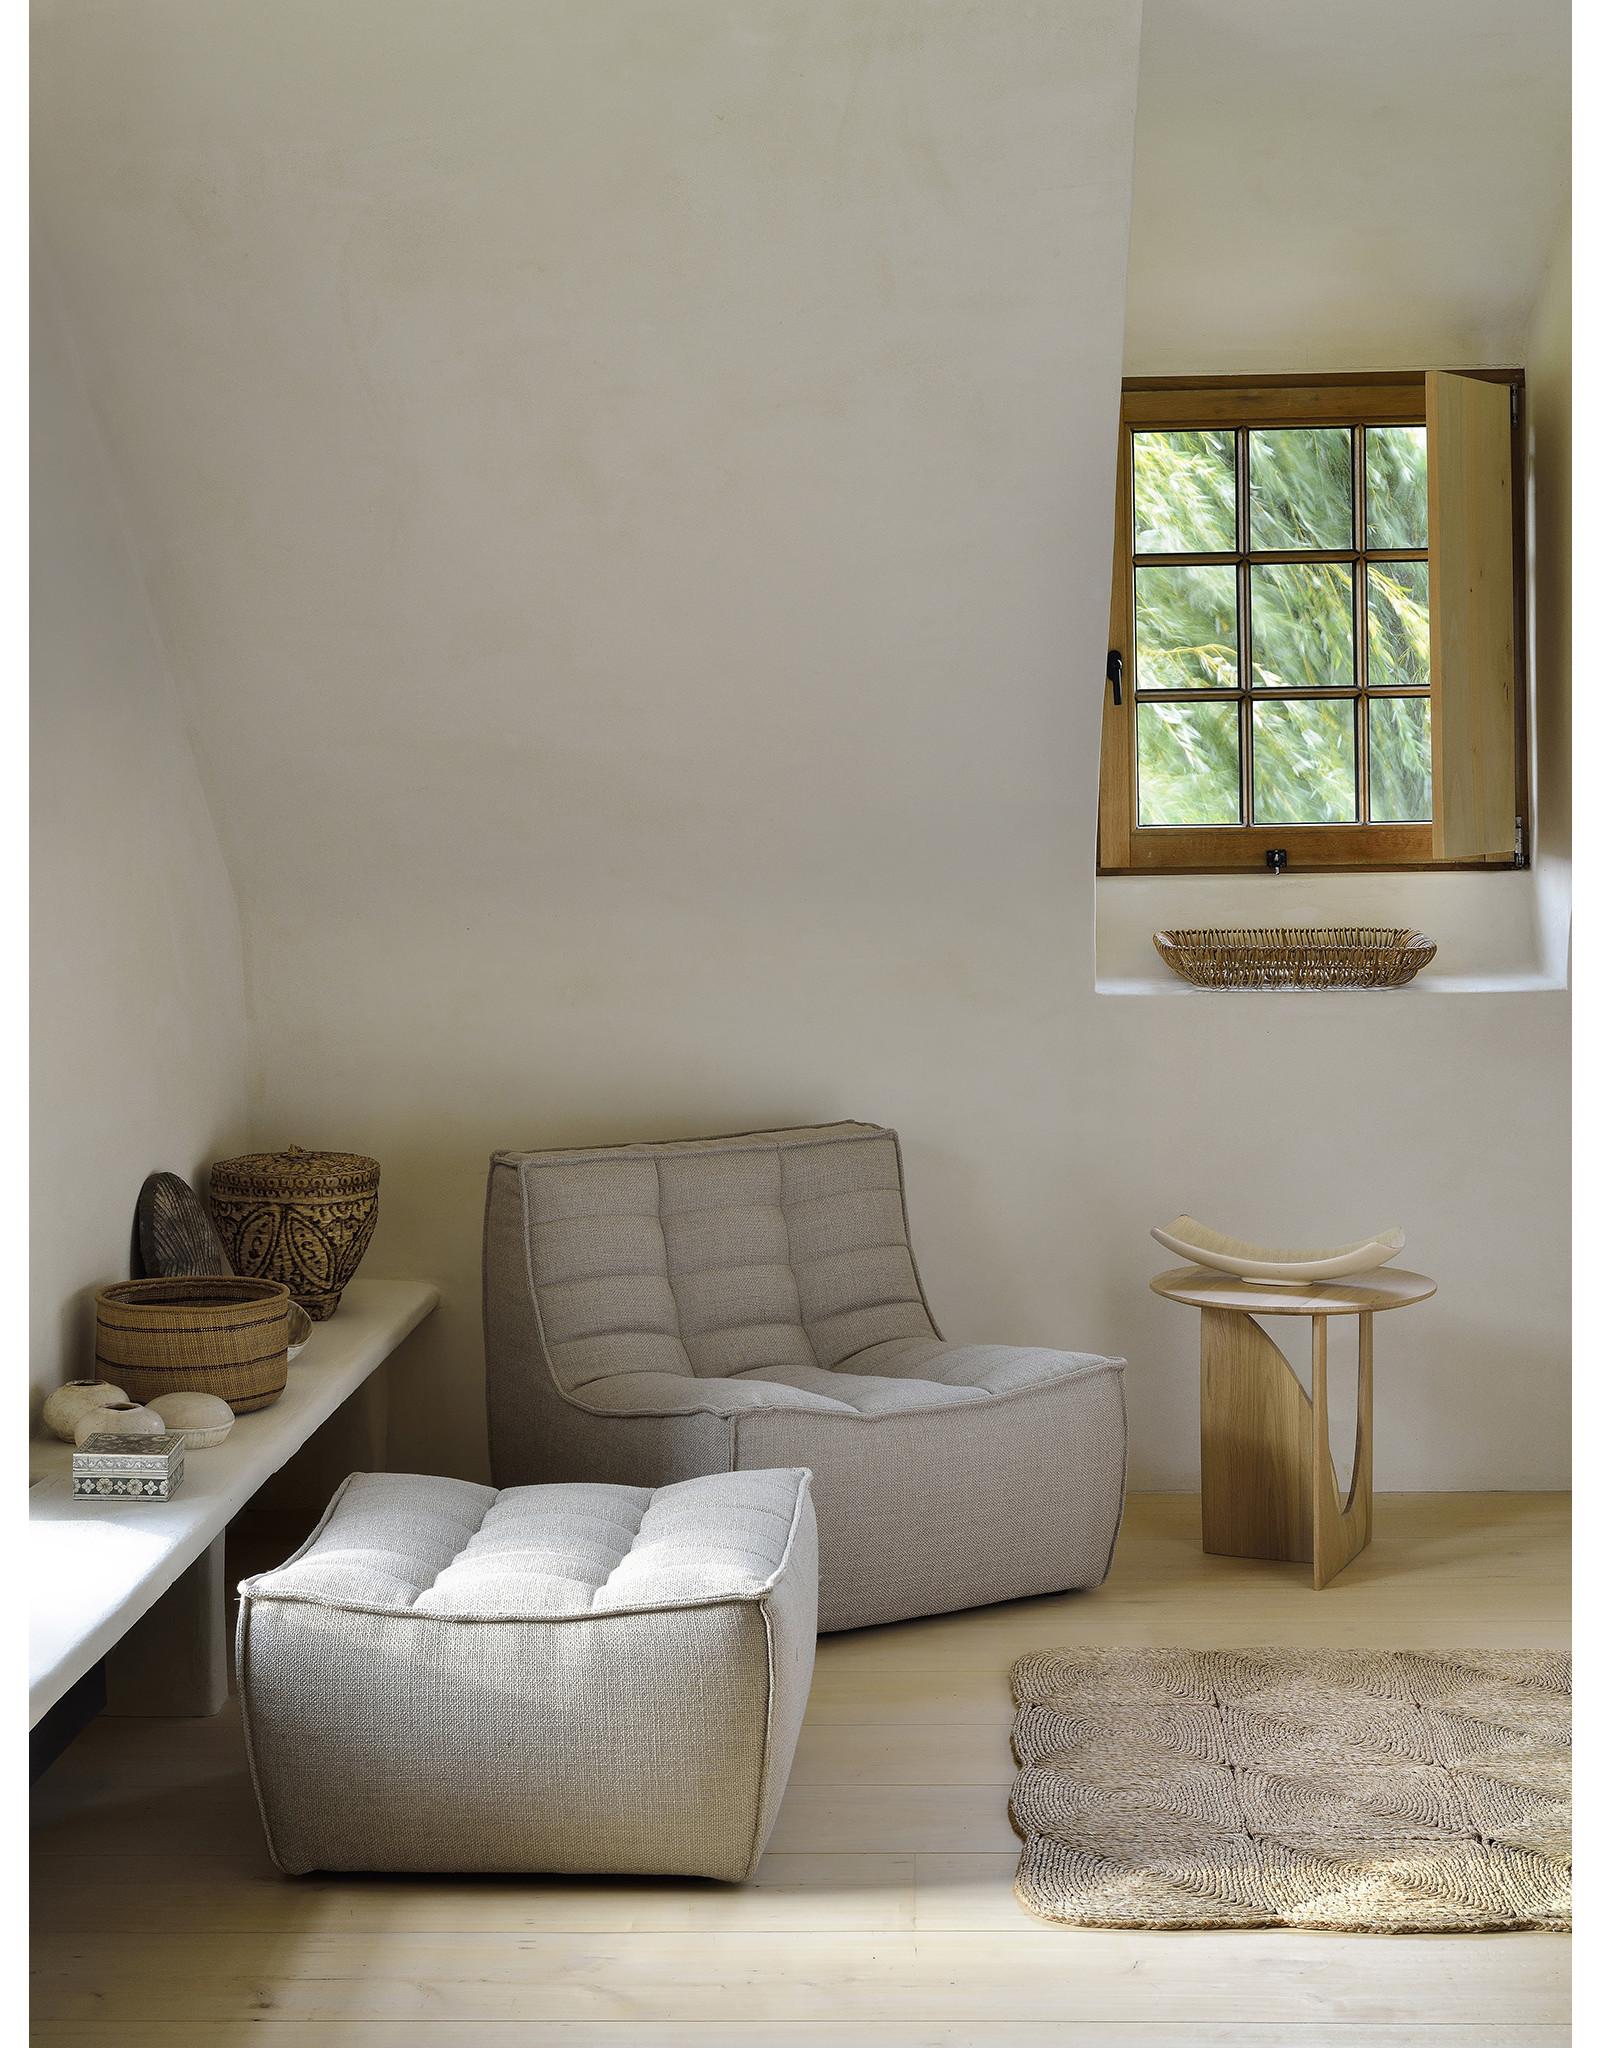 Ethnicraft N701 Footstool - Beige